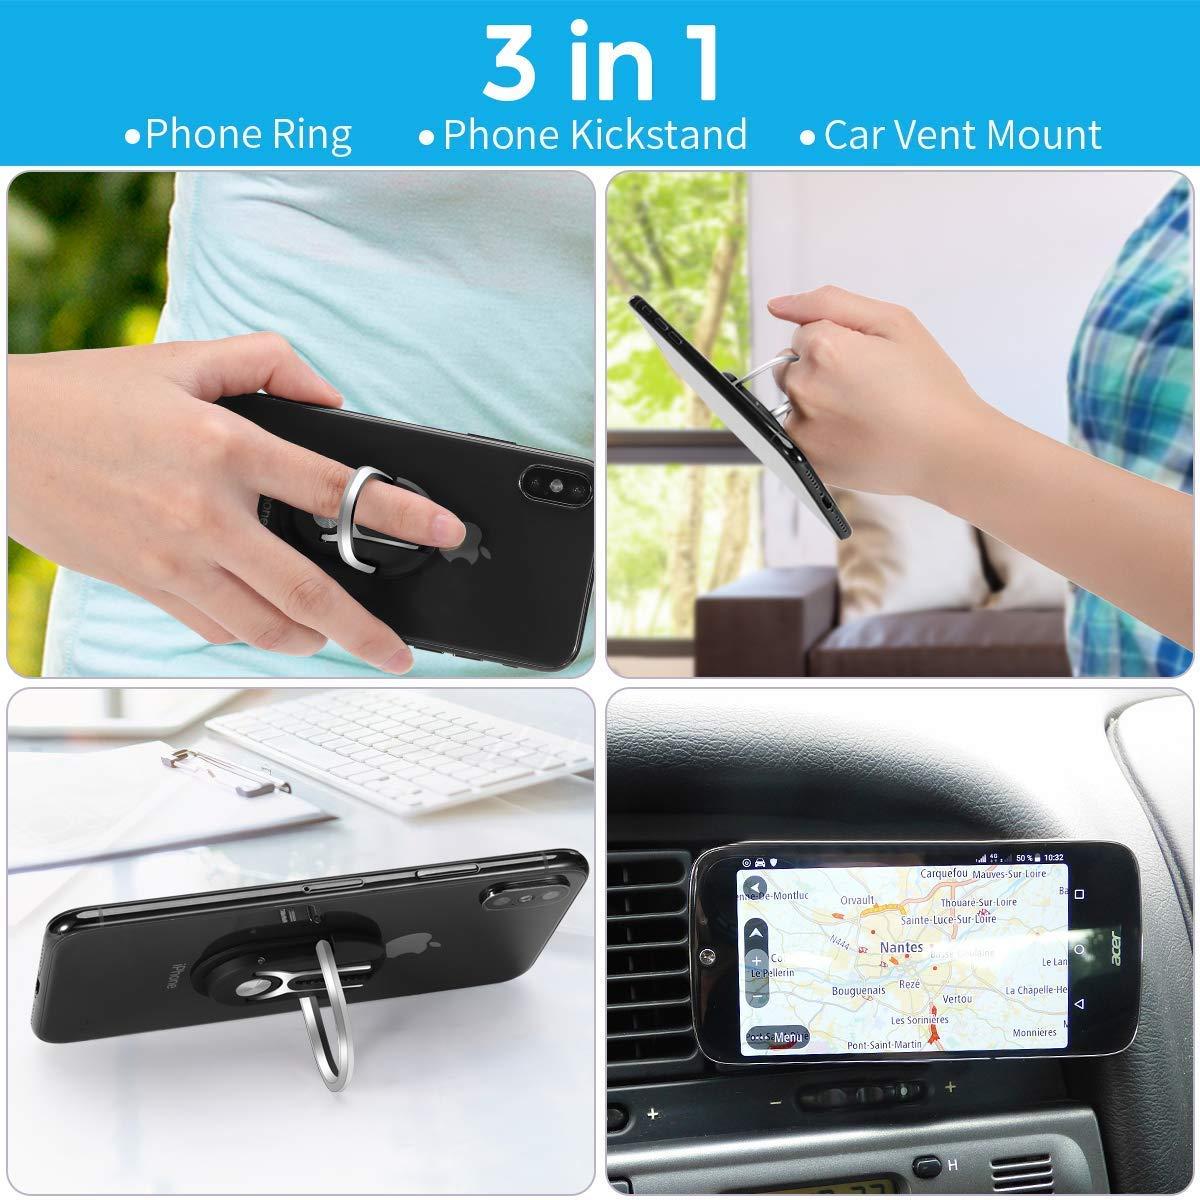 Universal Air Vent Car Phone Mount 3 in 1 Mobile Phone Stand 360 Degree Rotation Multipurpose Phone Bracket Phone Ring Holder Finger Kickstand Blue